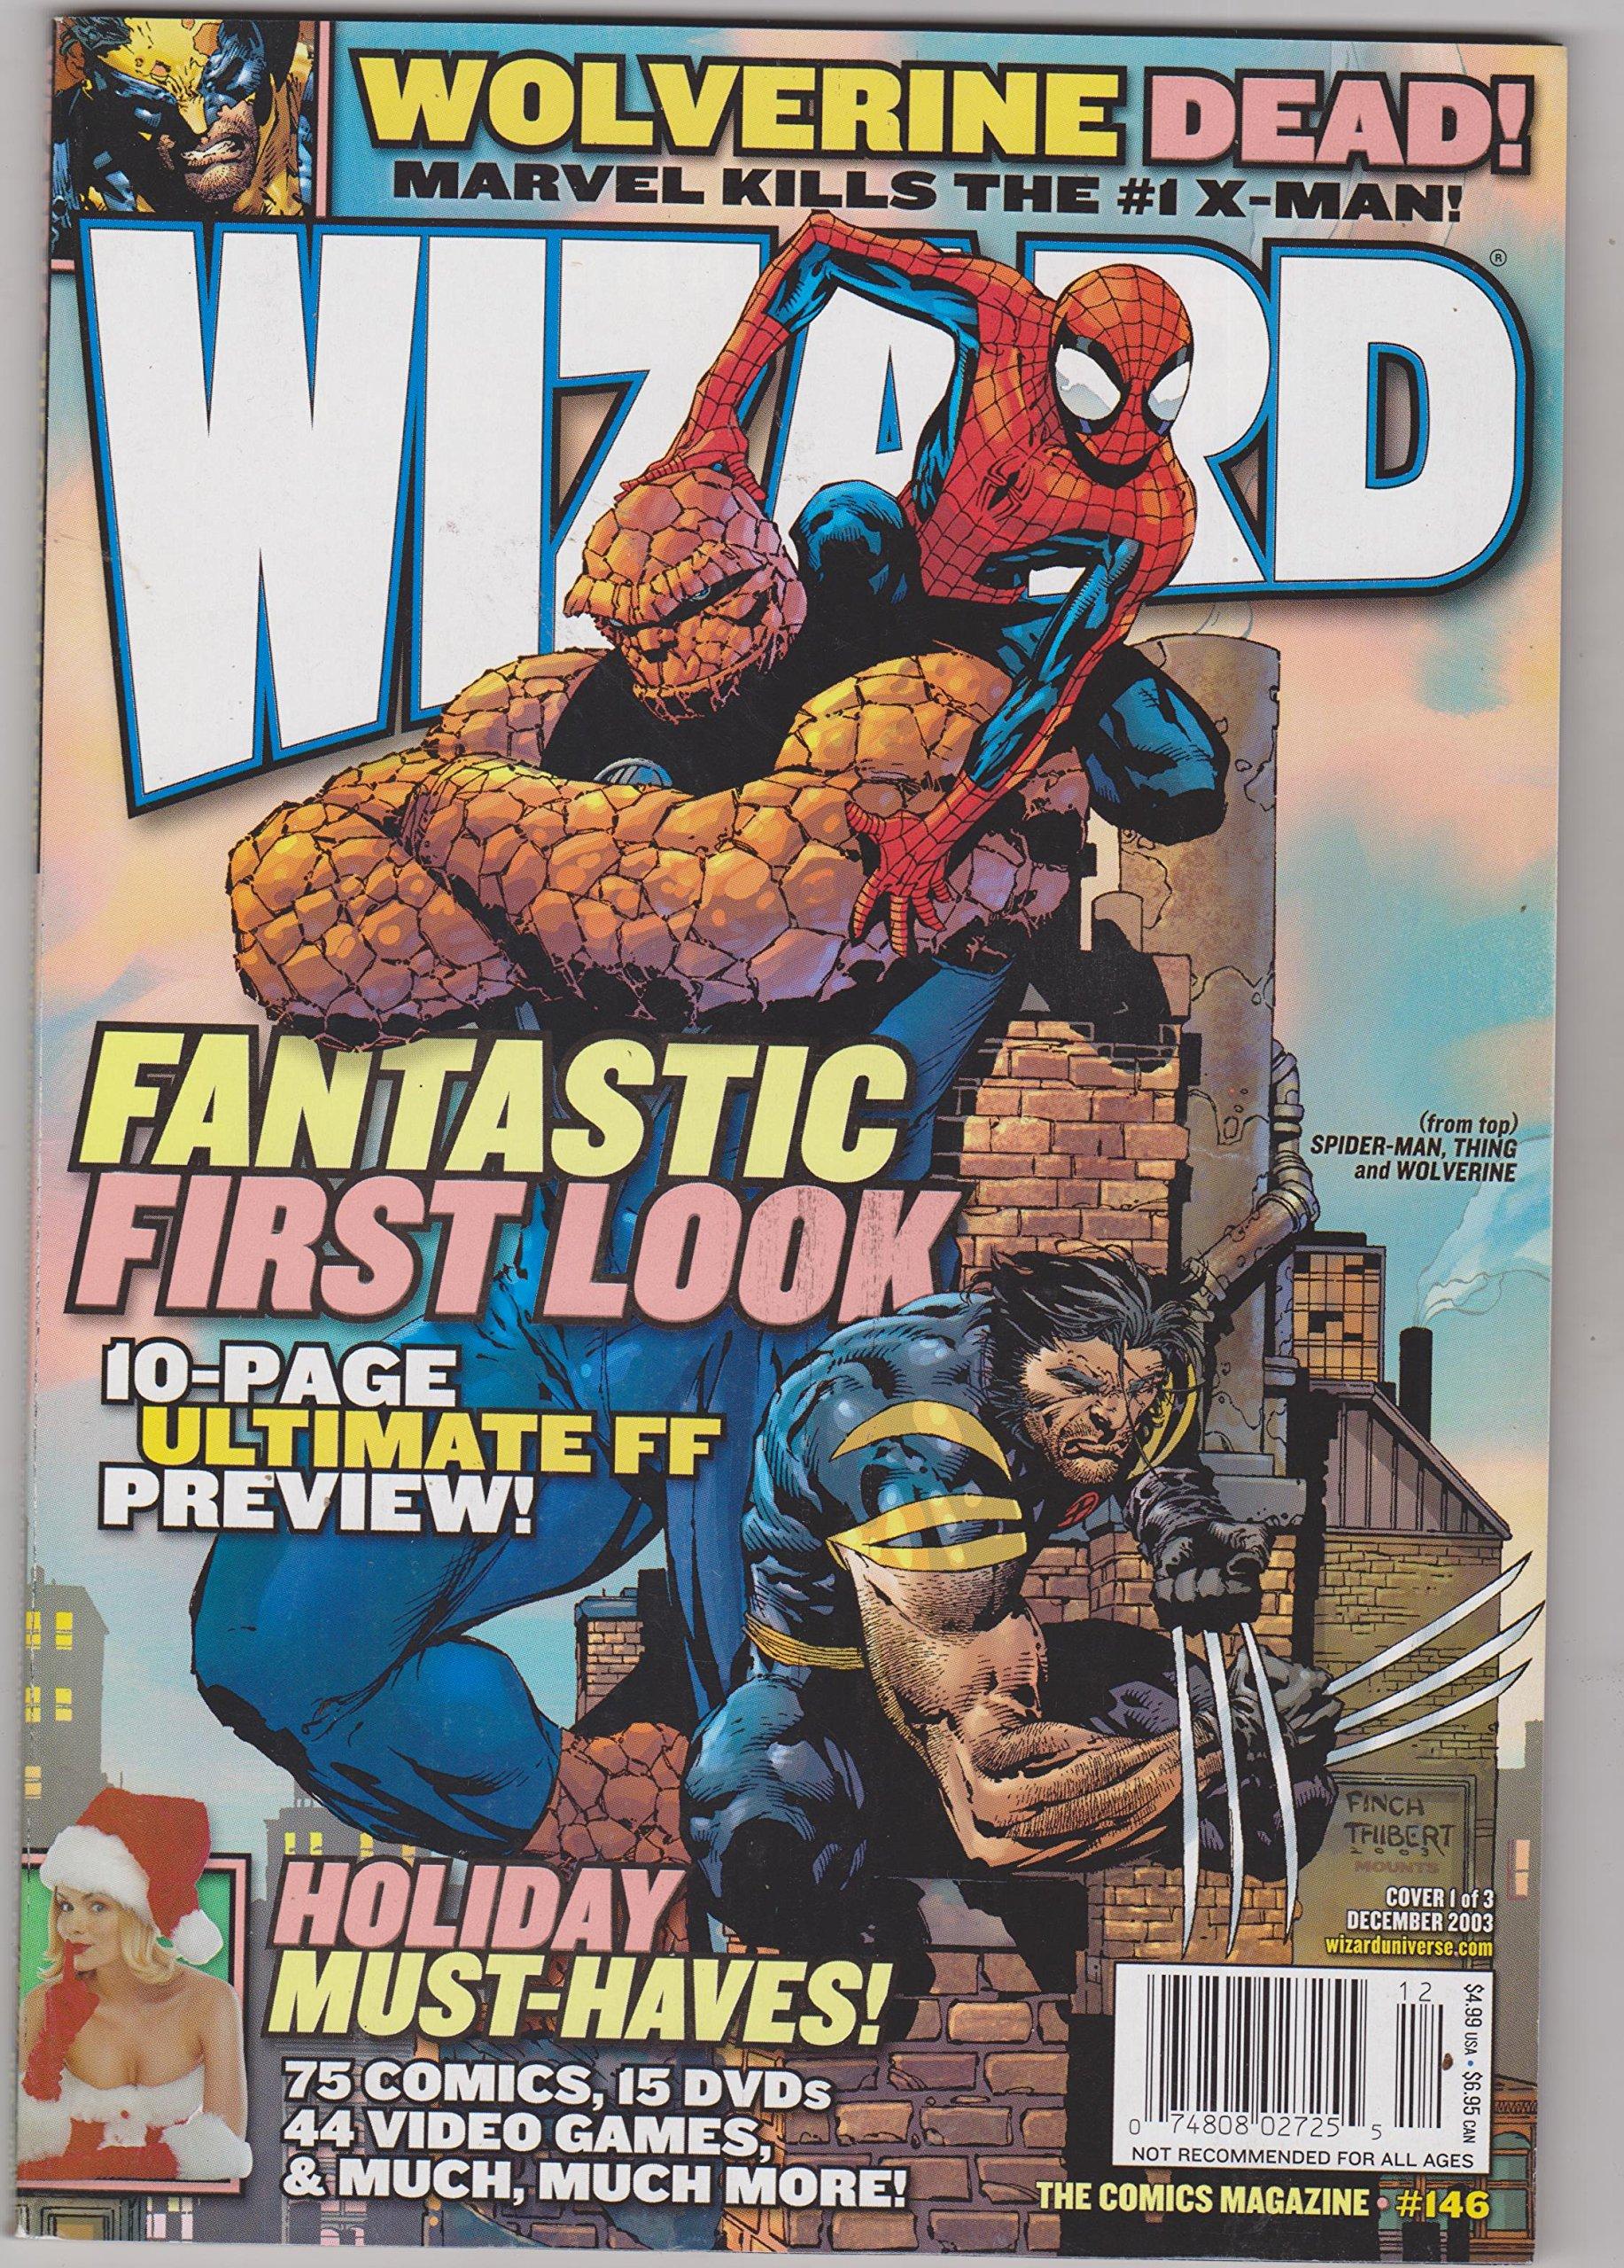 Wizard: The Comics Magazine #146, December 2003 pdf